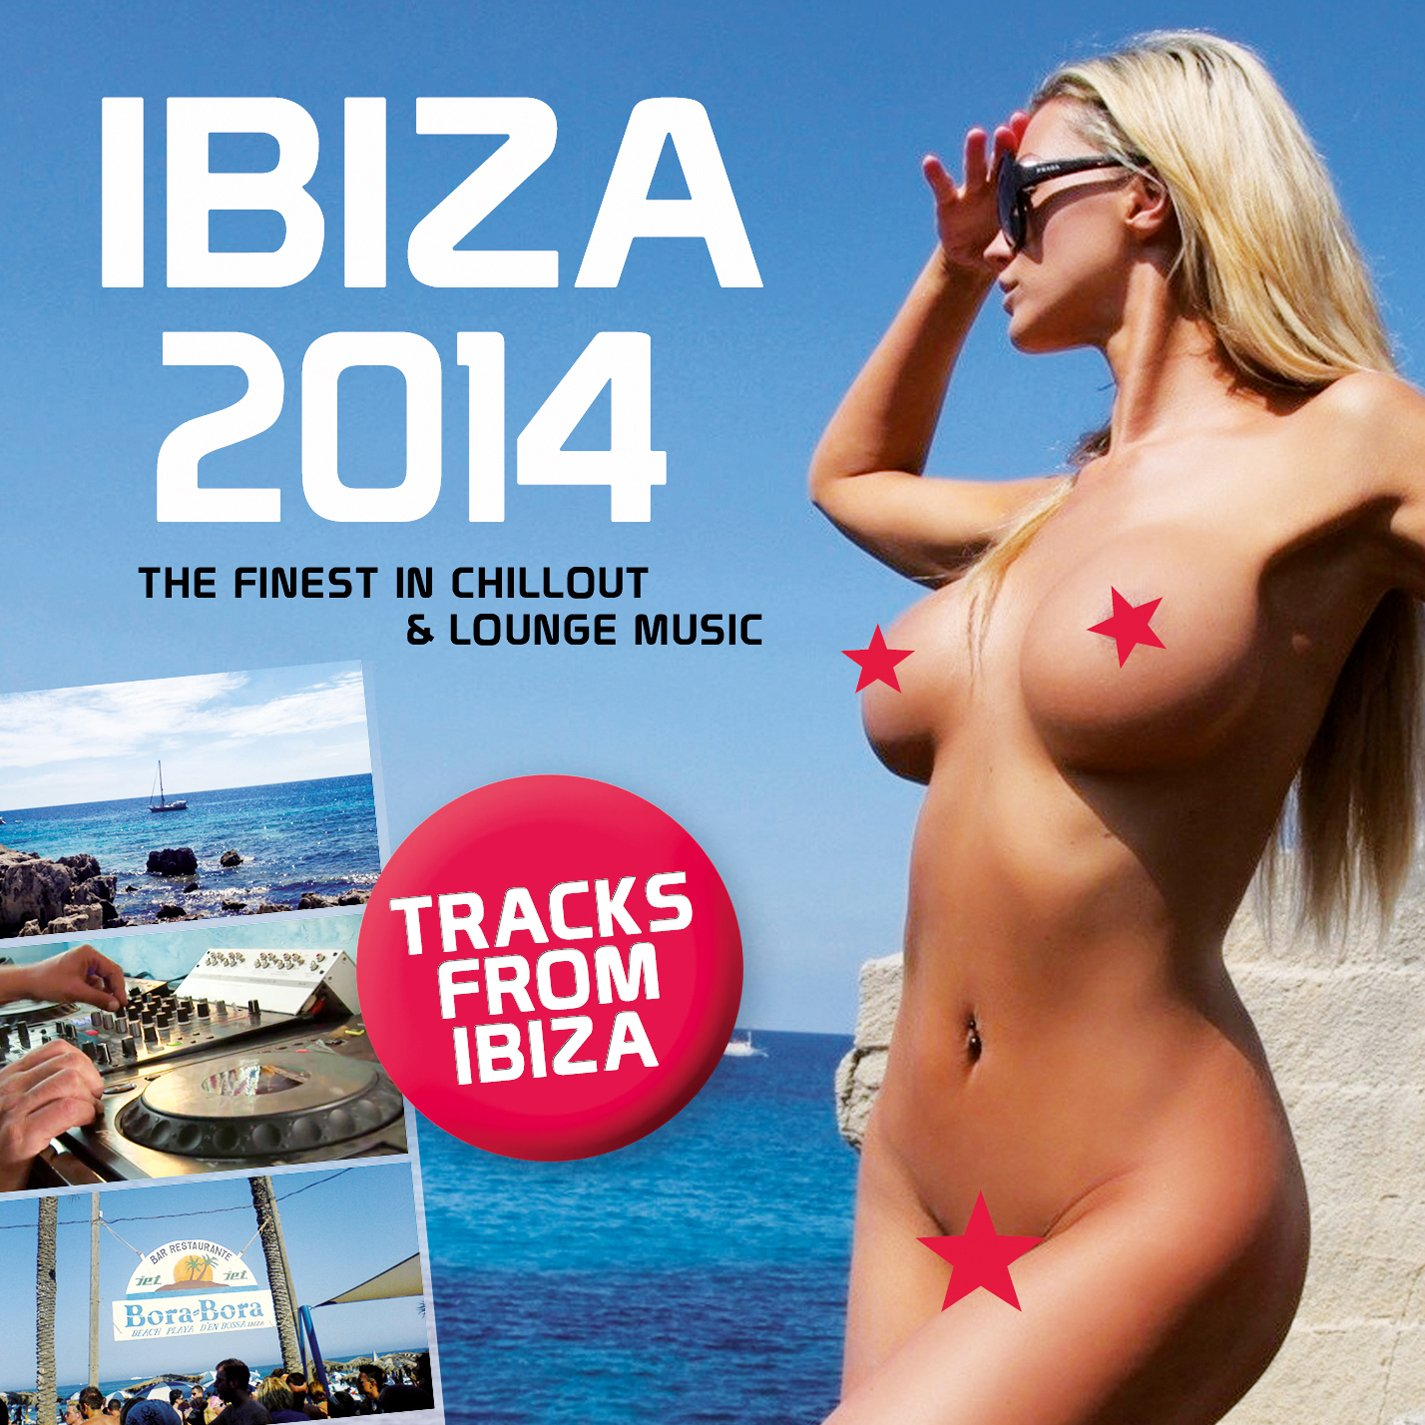 Ibiza 2014                                                                                                                                                                                                                                                                                                                                                                                                <span class=